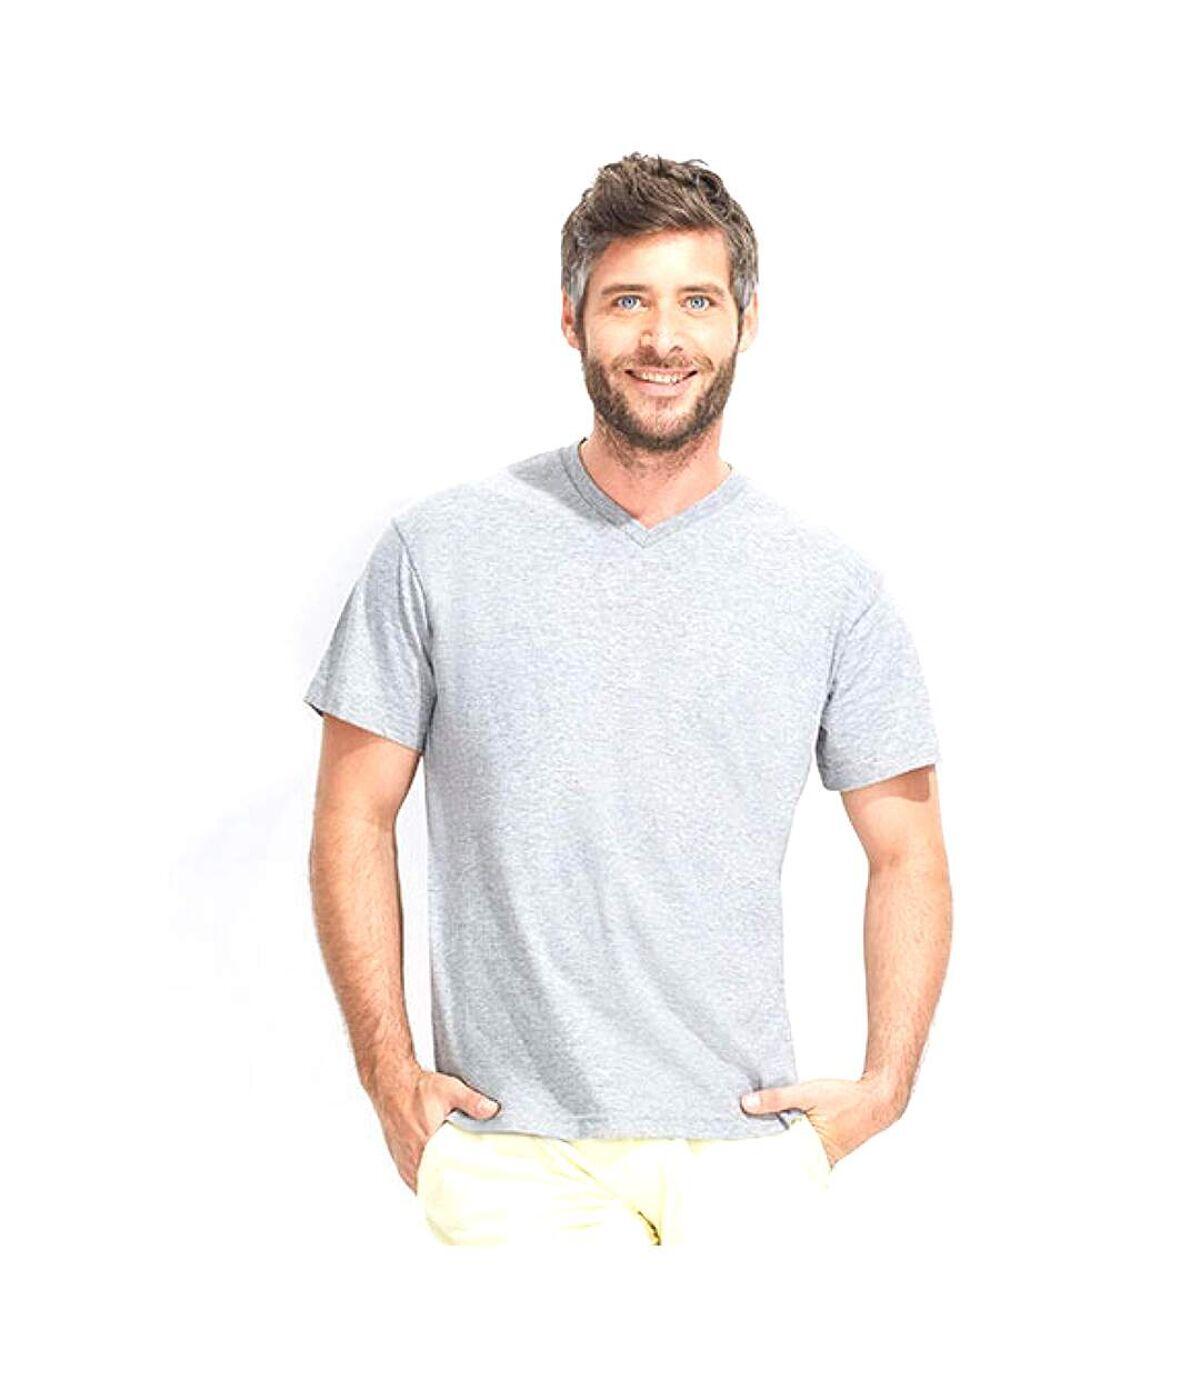 SOLS Mens Victory V Neck Short Sleeve T-Shirt (White) - UTPC388